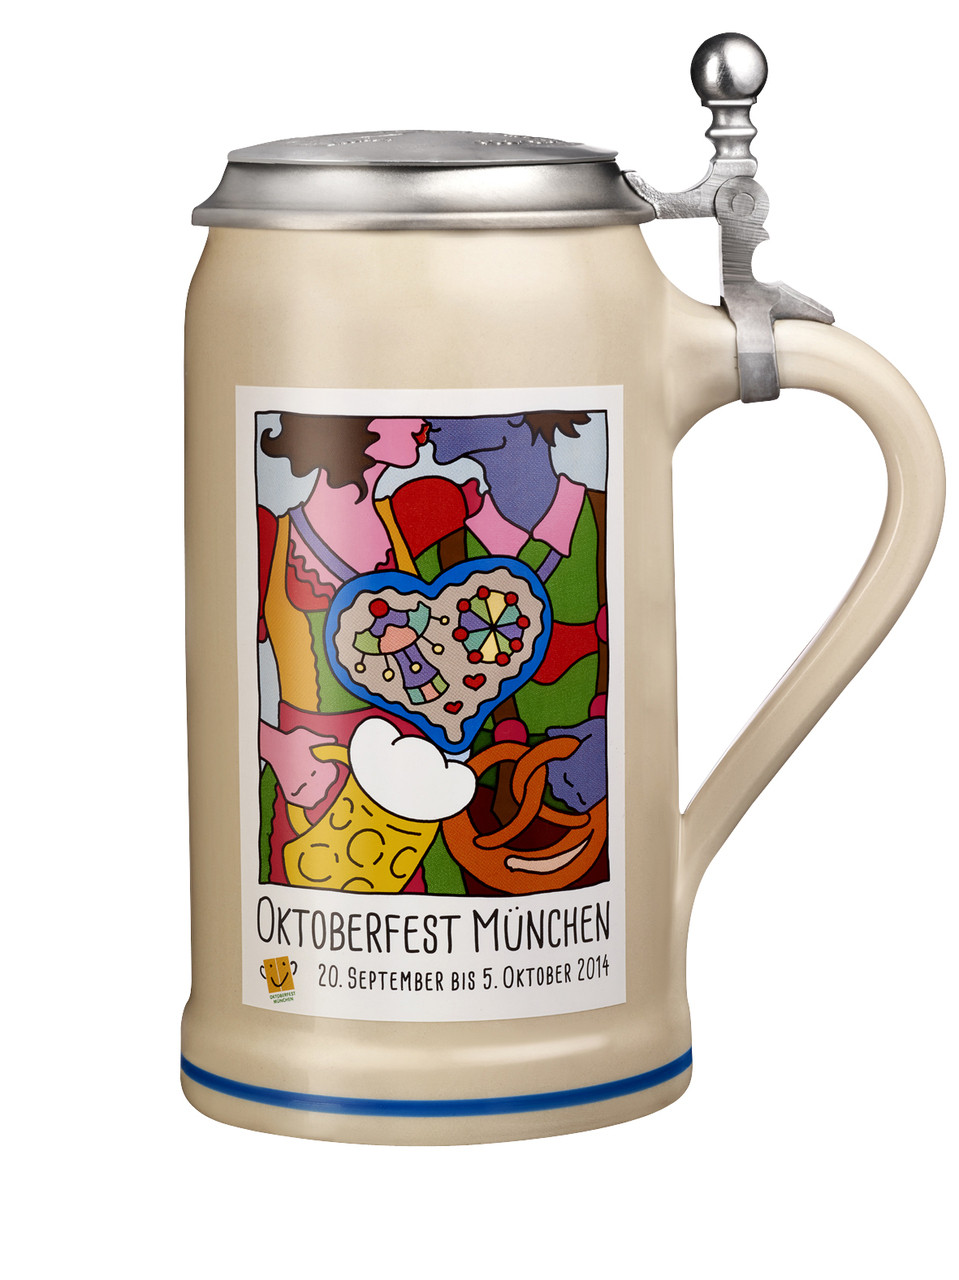 Munich 2014 Official Oktoberfest Beer Stein